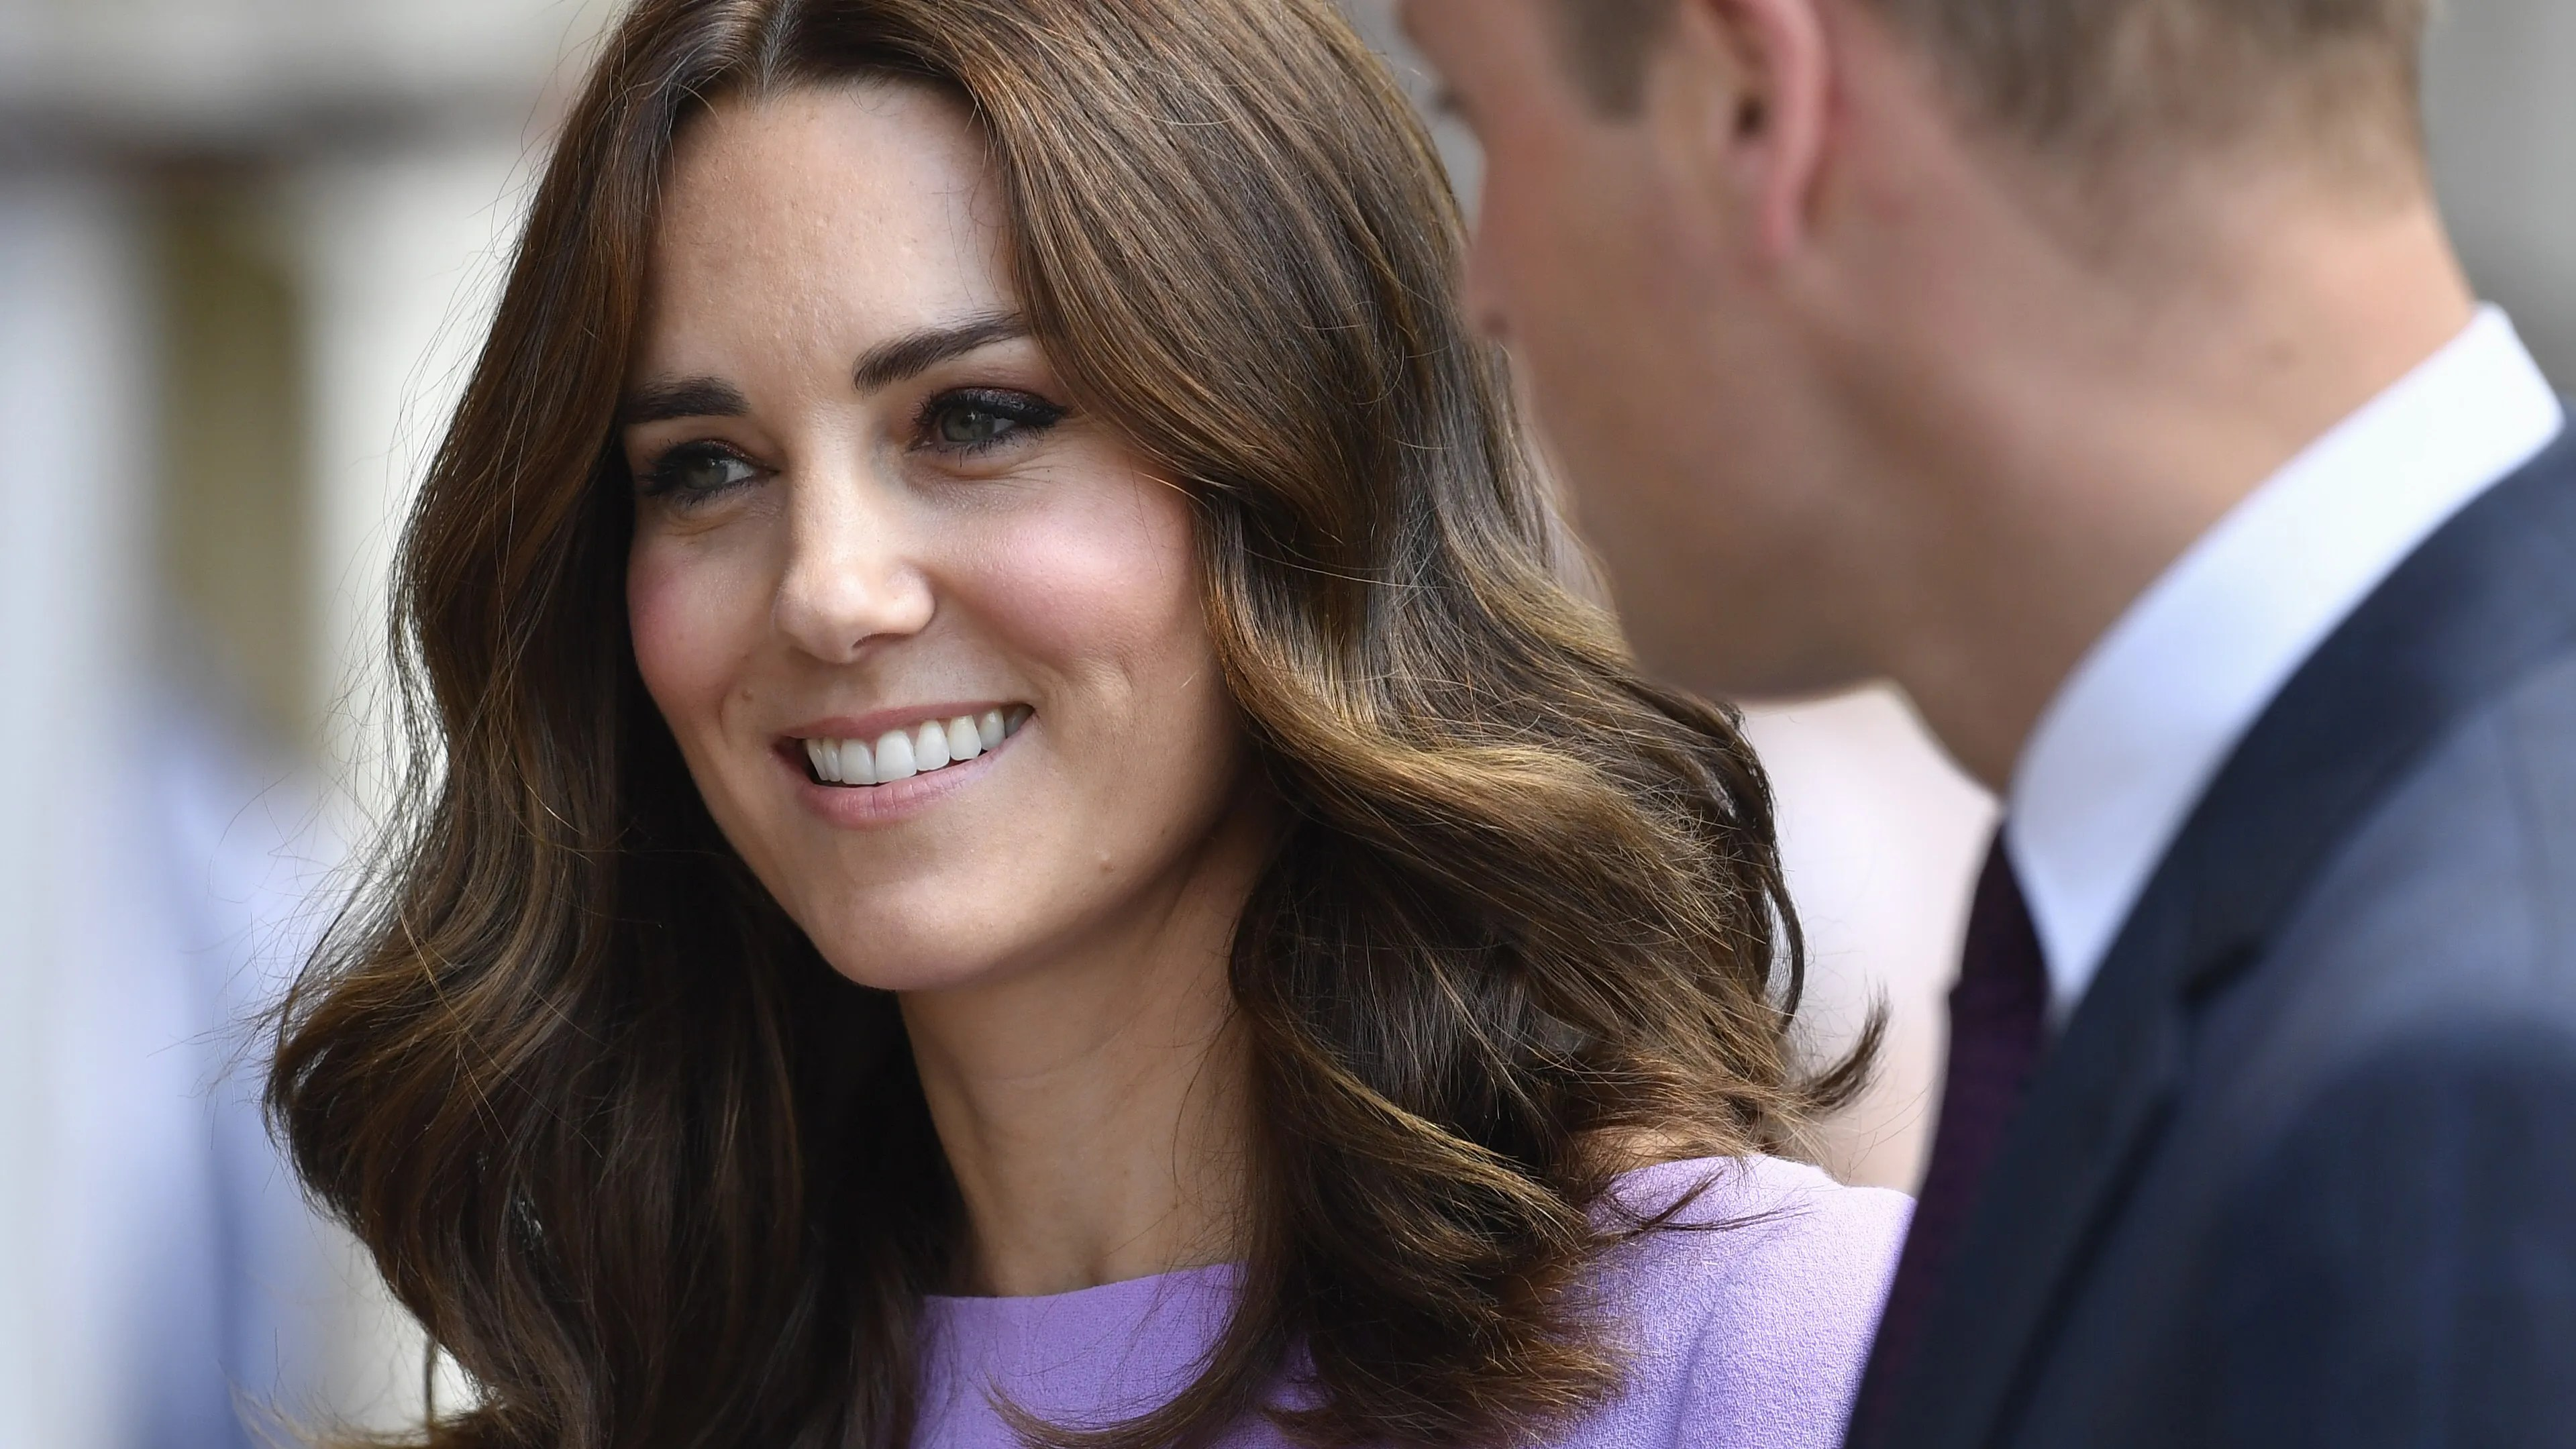 This Kate Middleton Hair Conspiracy Actually Checks Out